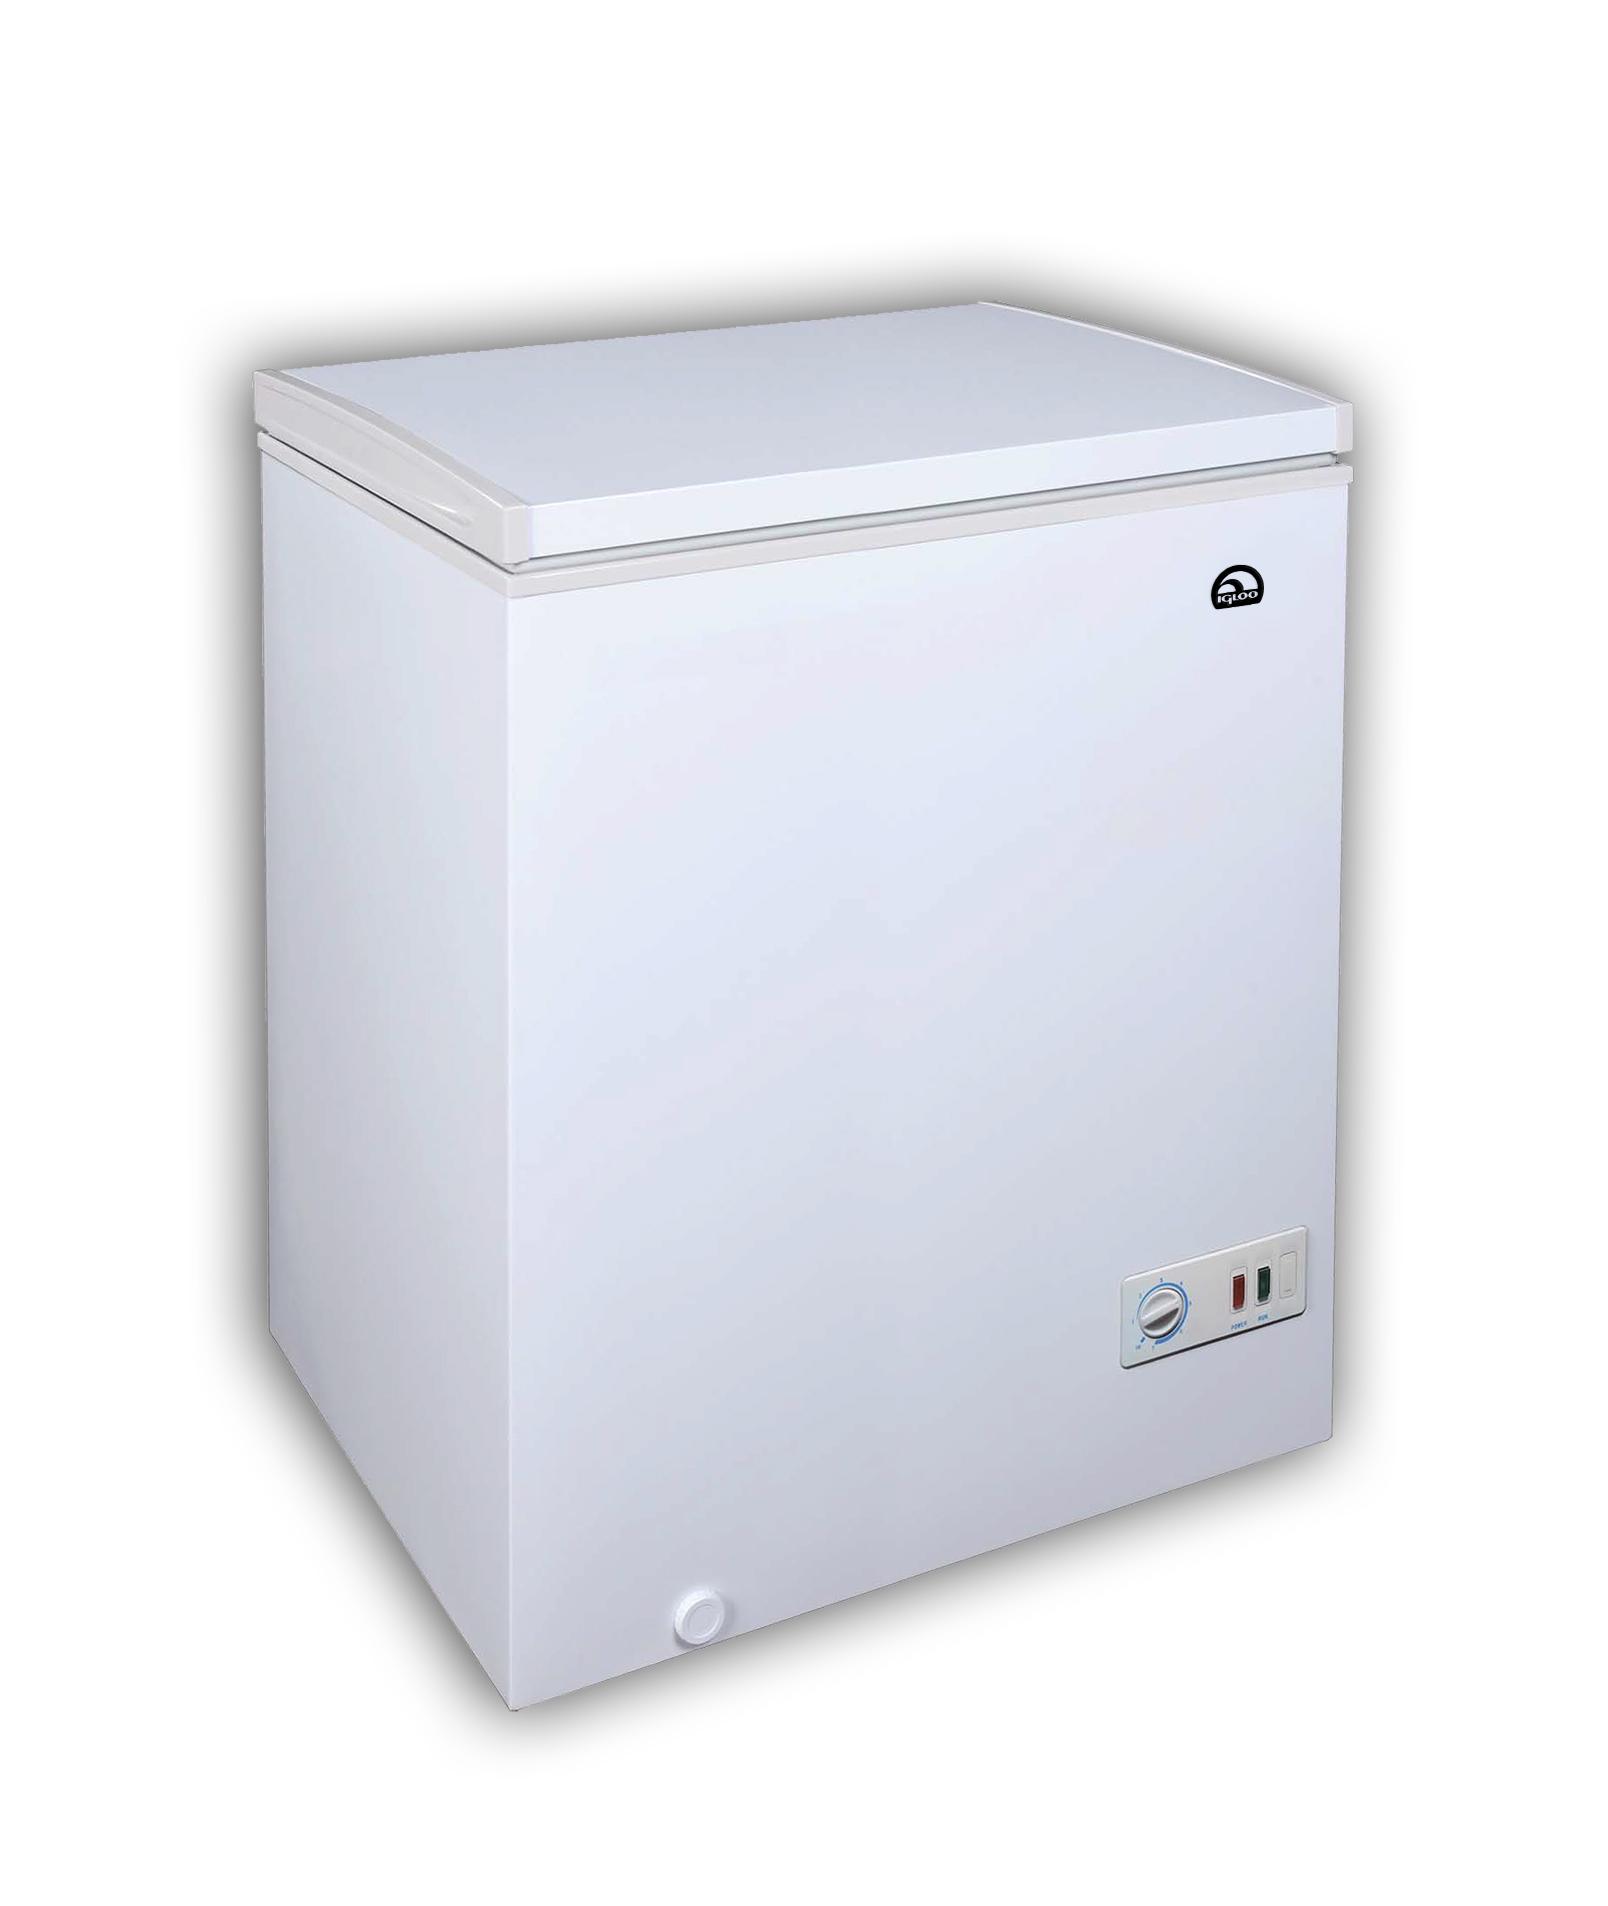 lights igloo freezer instruction manual 3.5